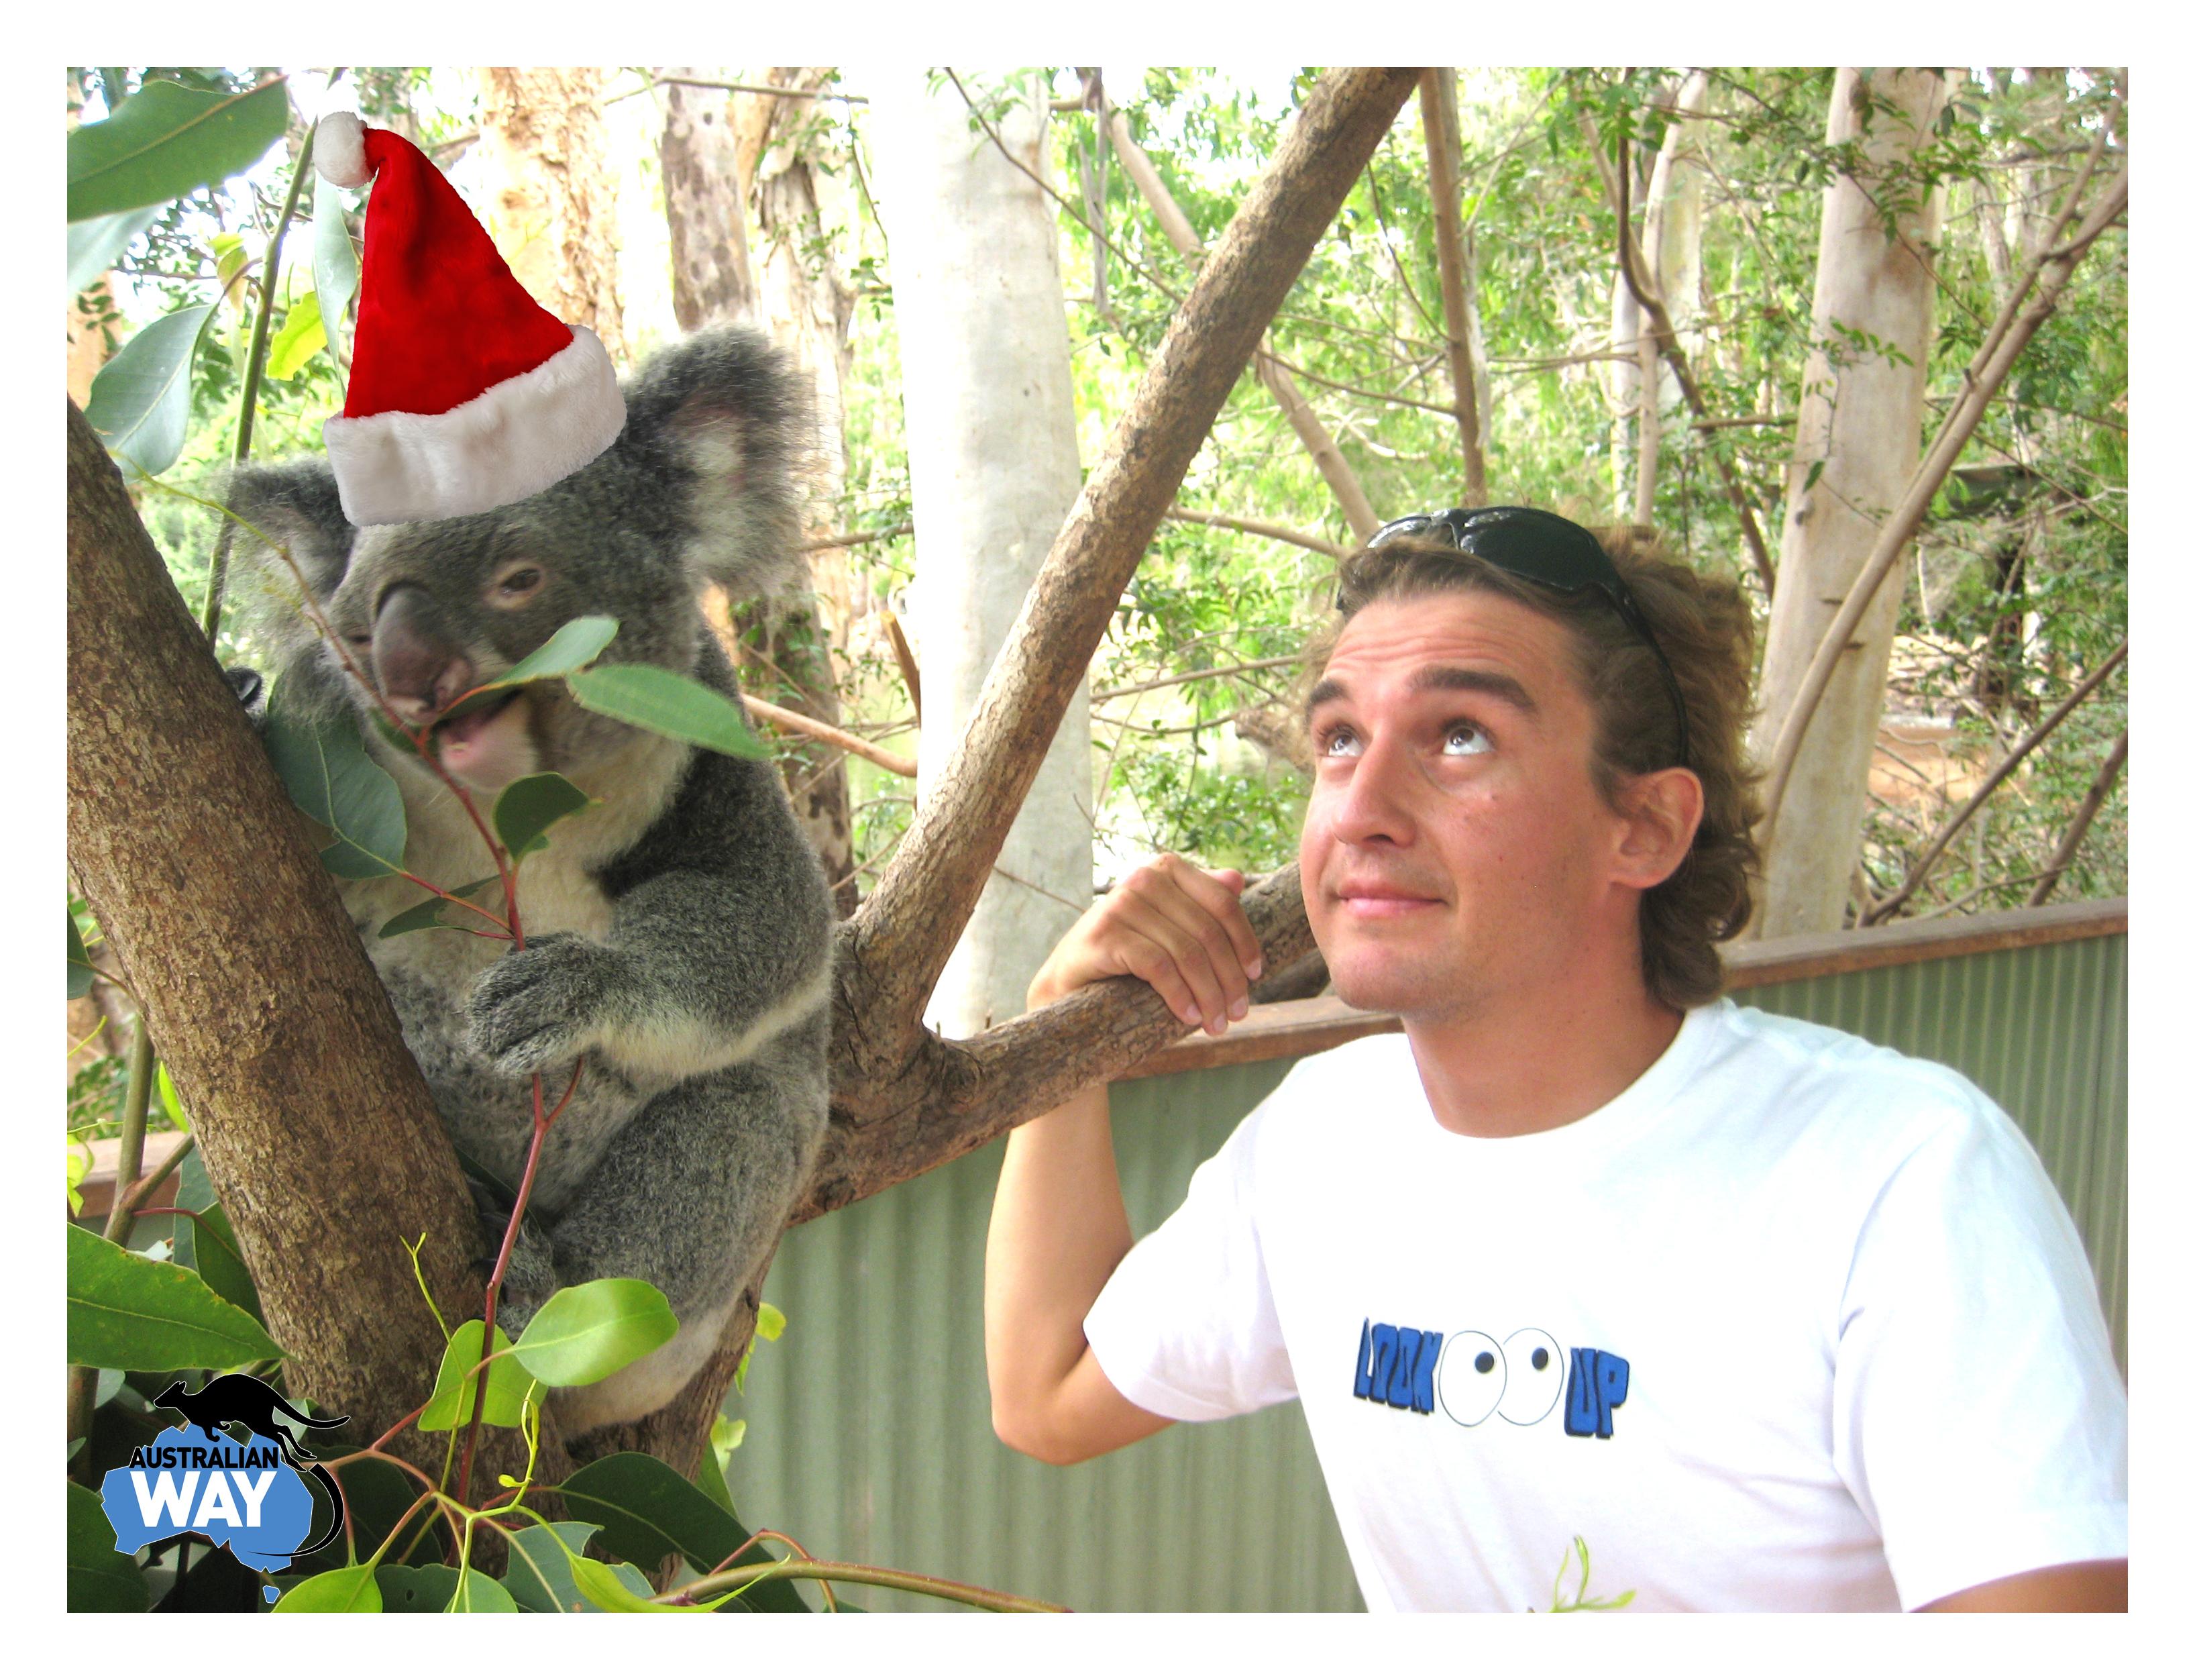 AUSTRALIAN WAY CHRISTMAS, estudiar en australia, australian way2